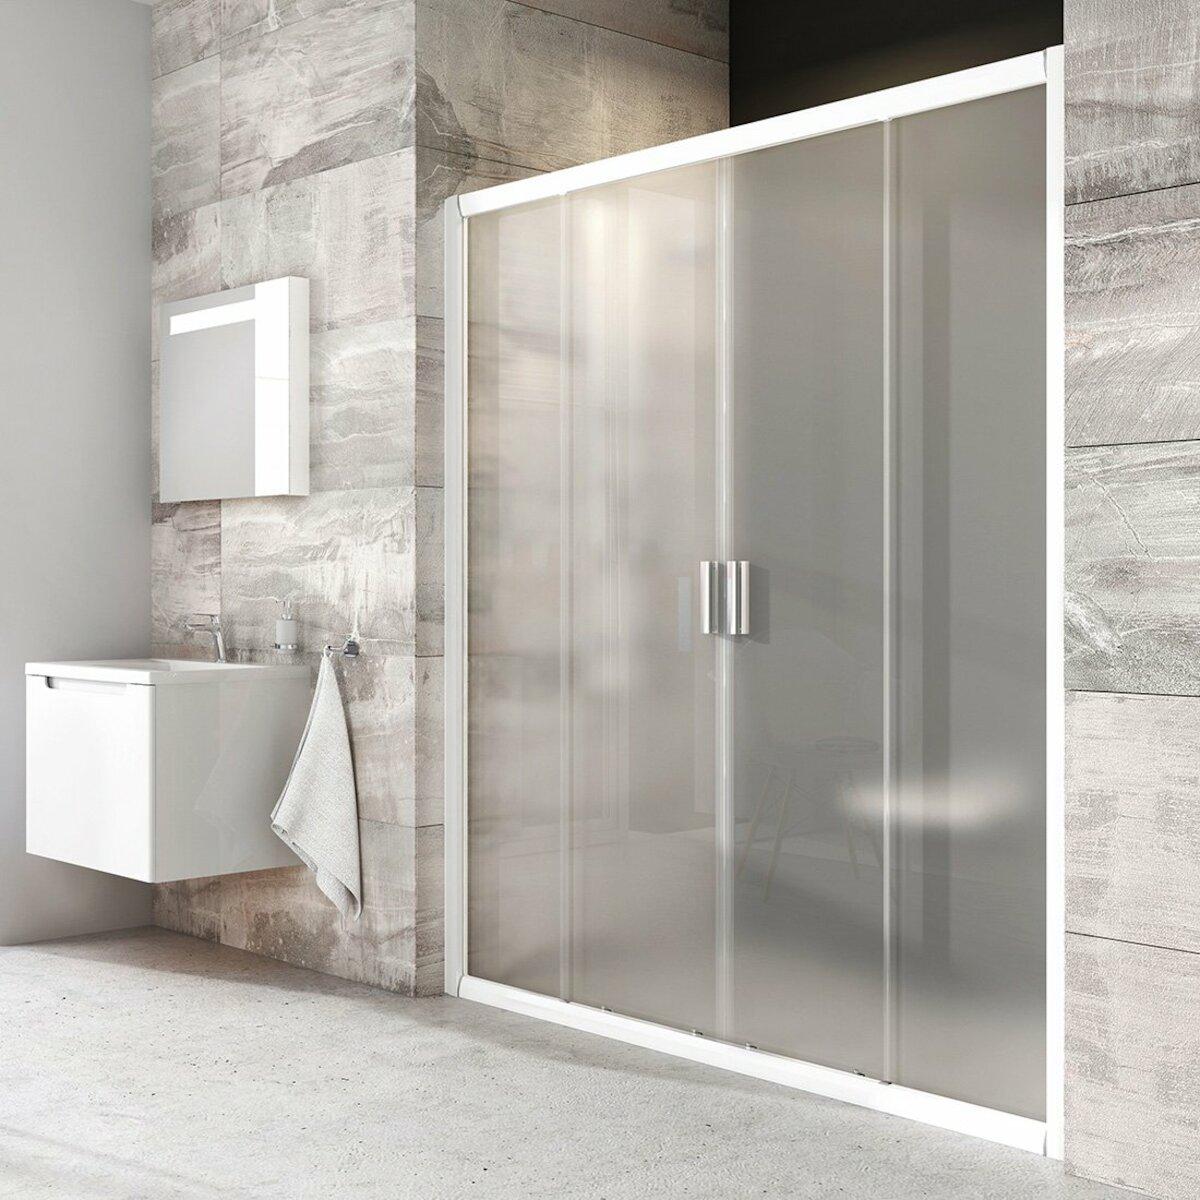 Sprchové dvere 180x190 cm Ravak Blix biela 0YVY0100ZG